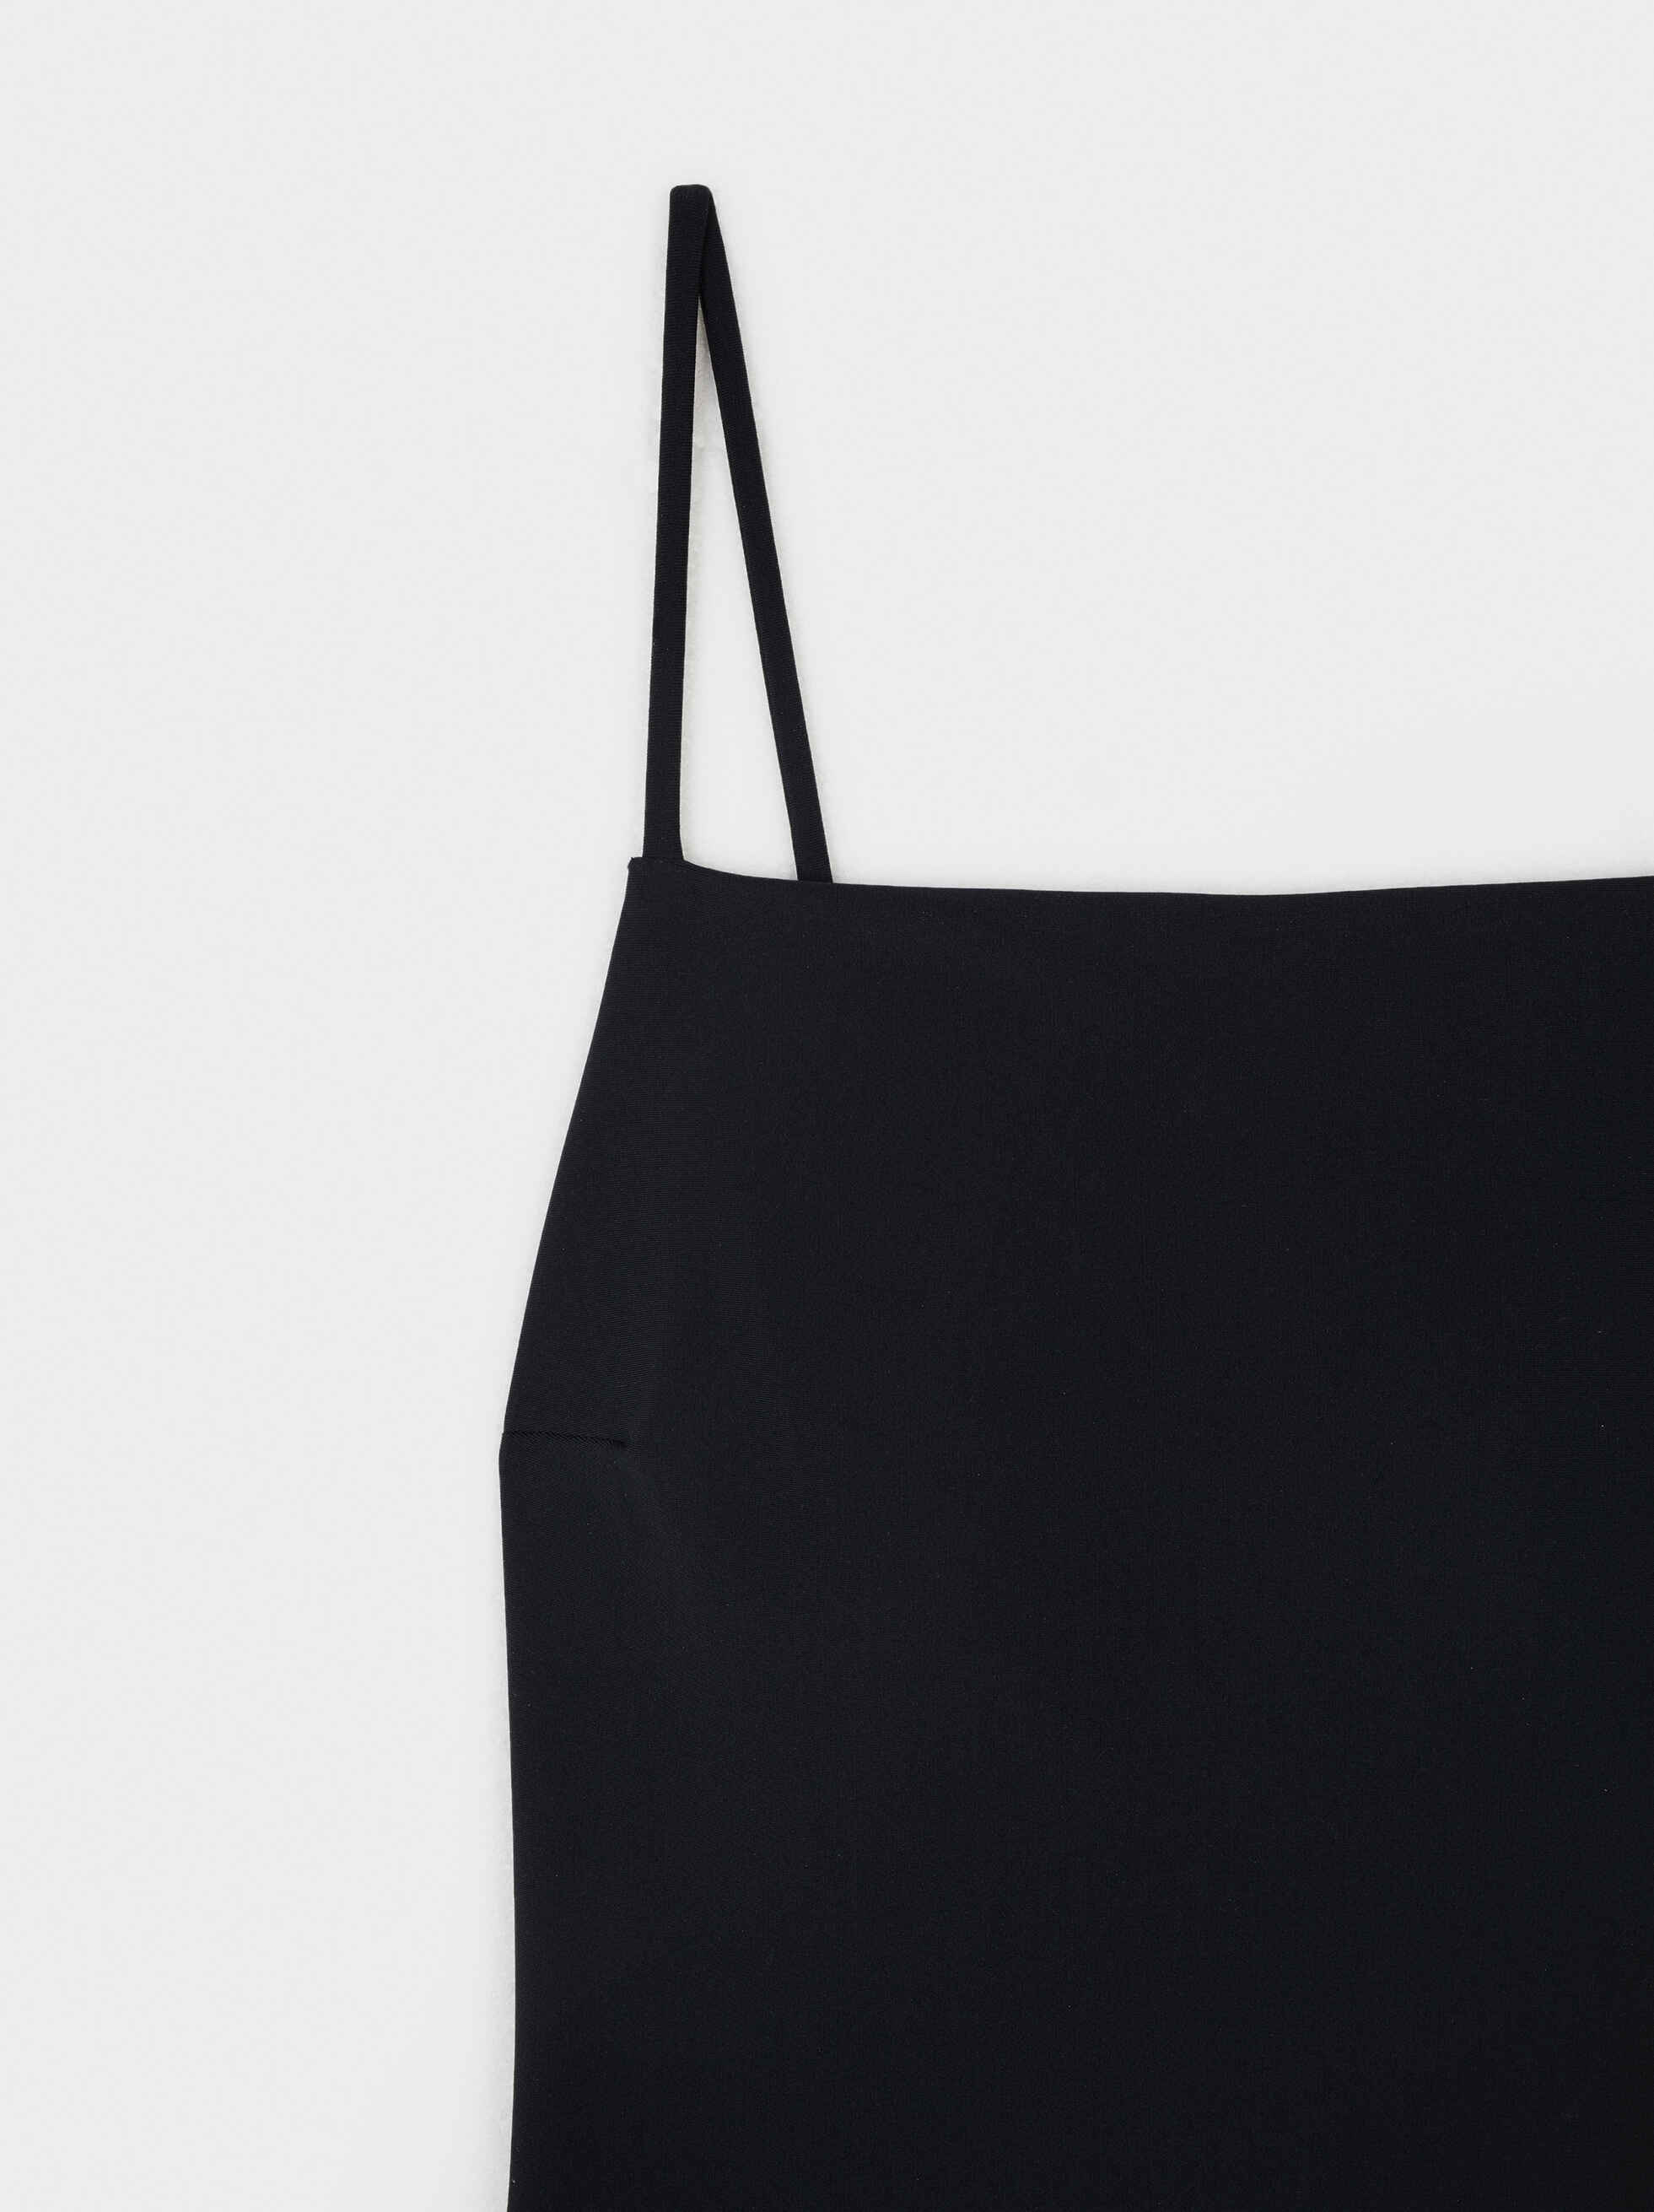 Swimming Costume With Straight Neckline, Black, hi-res